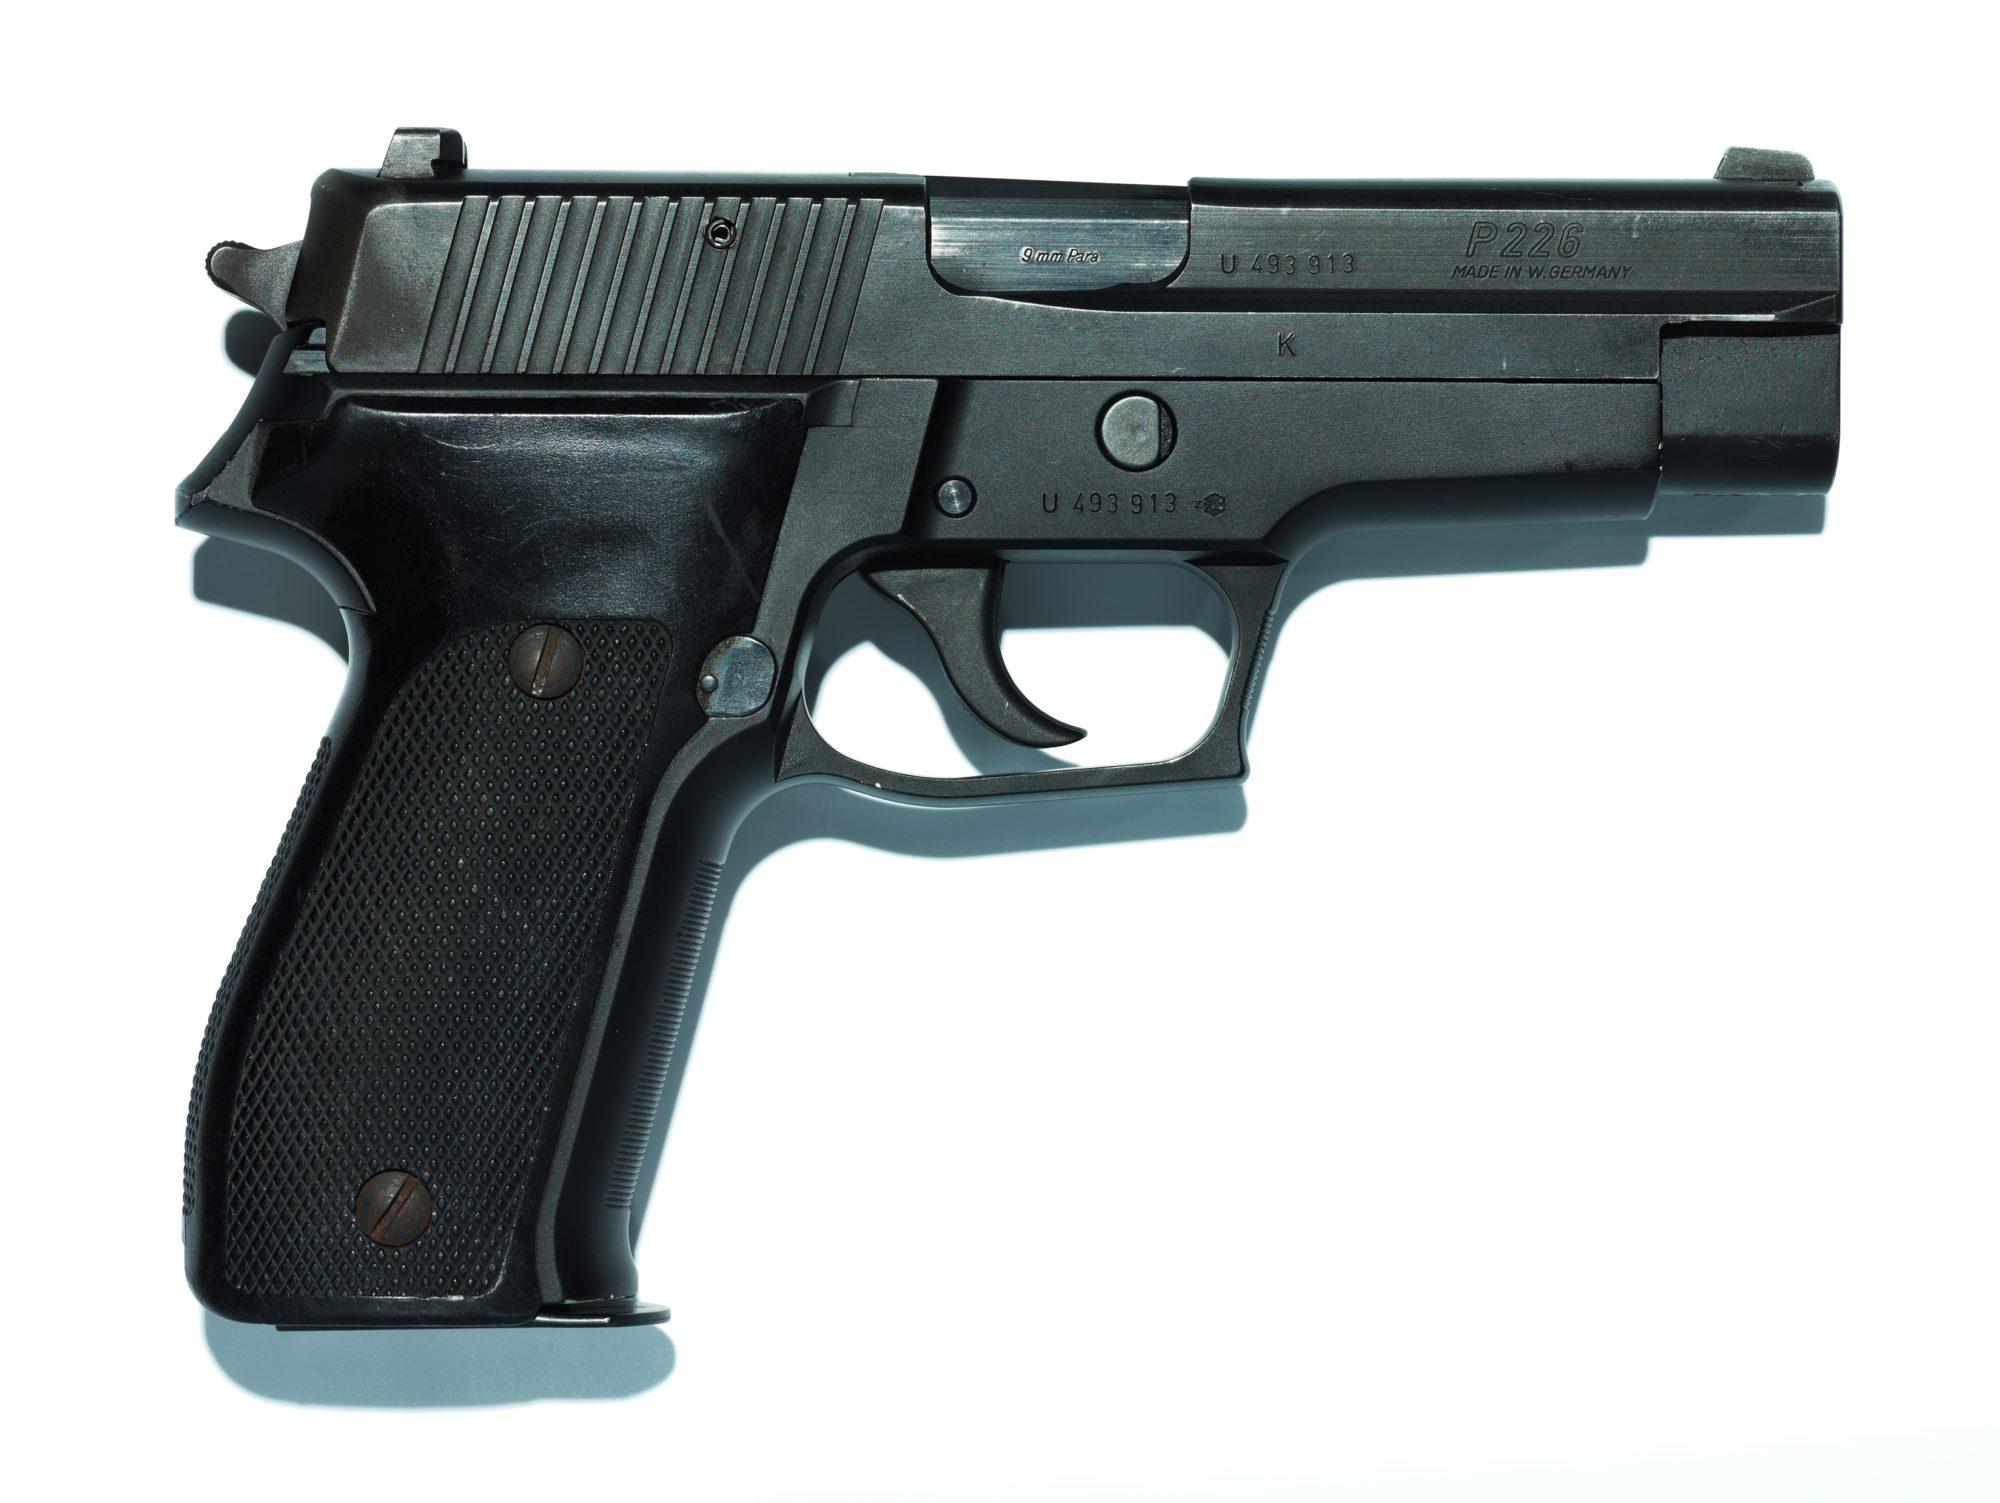 Marian Sell Gun11 U493913